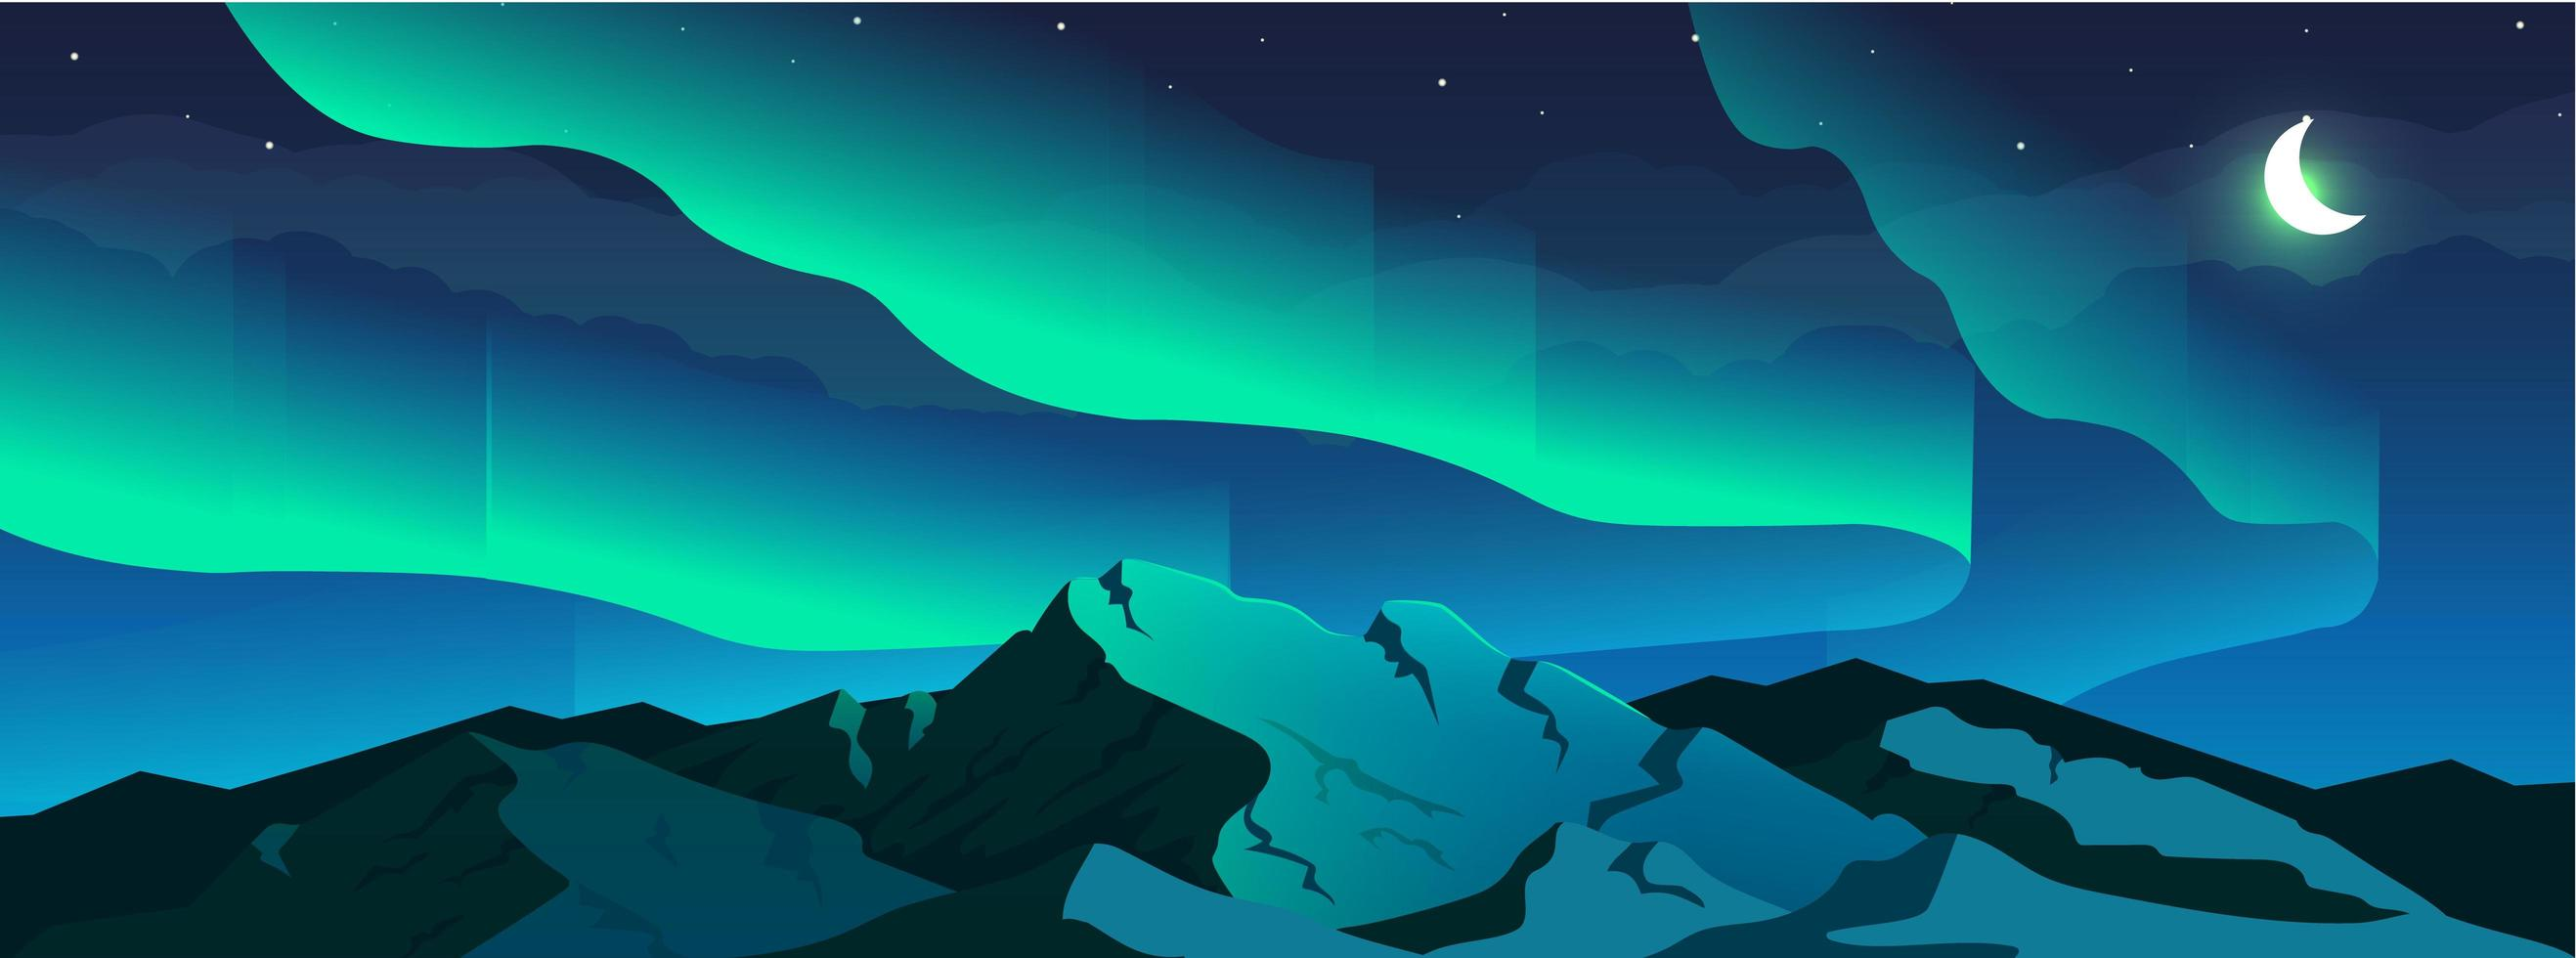 aurora borealis fenomeen egale kleur vectorillustratie vector